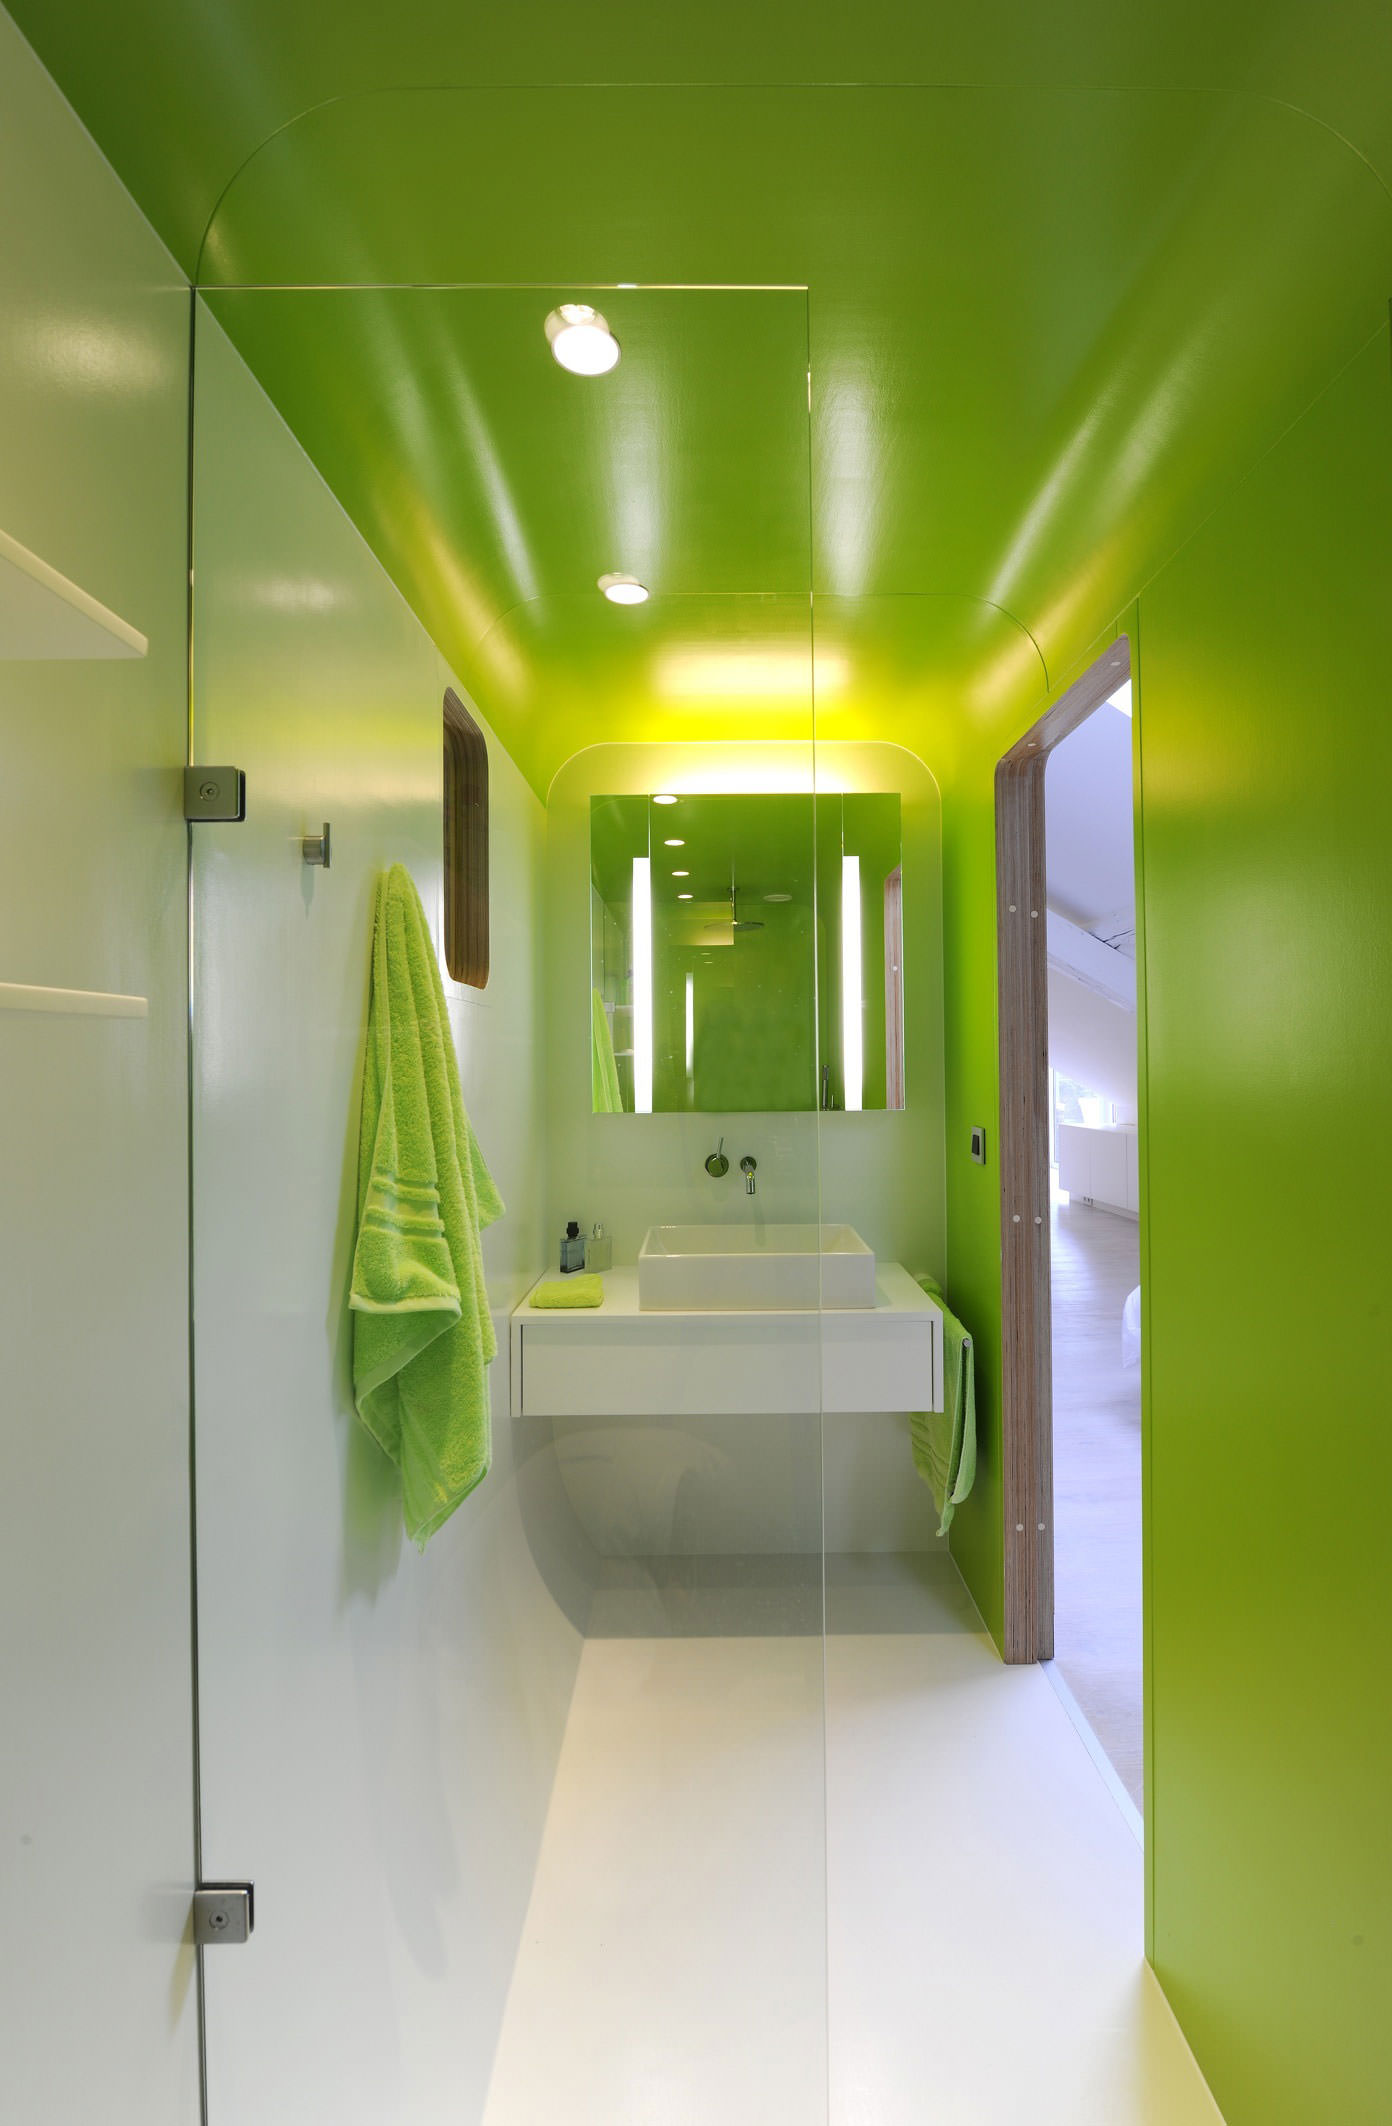 Бнло-зеленая современная ванная комната